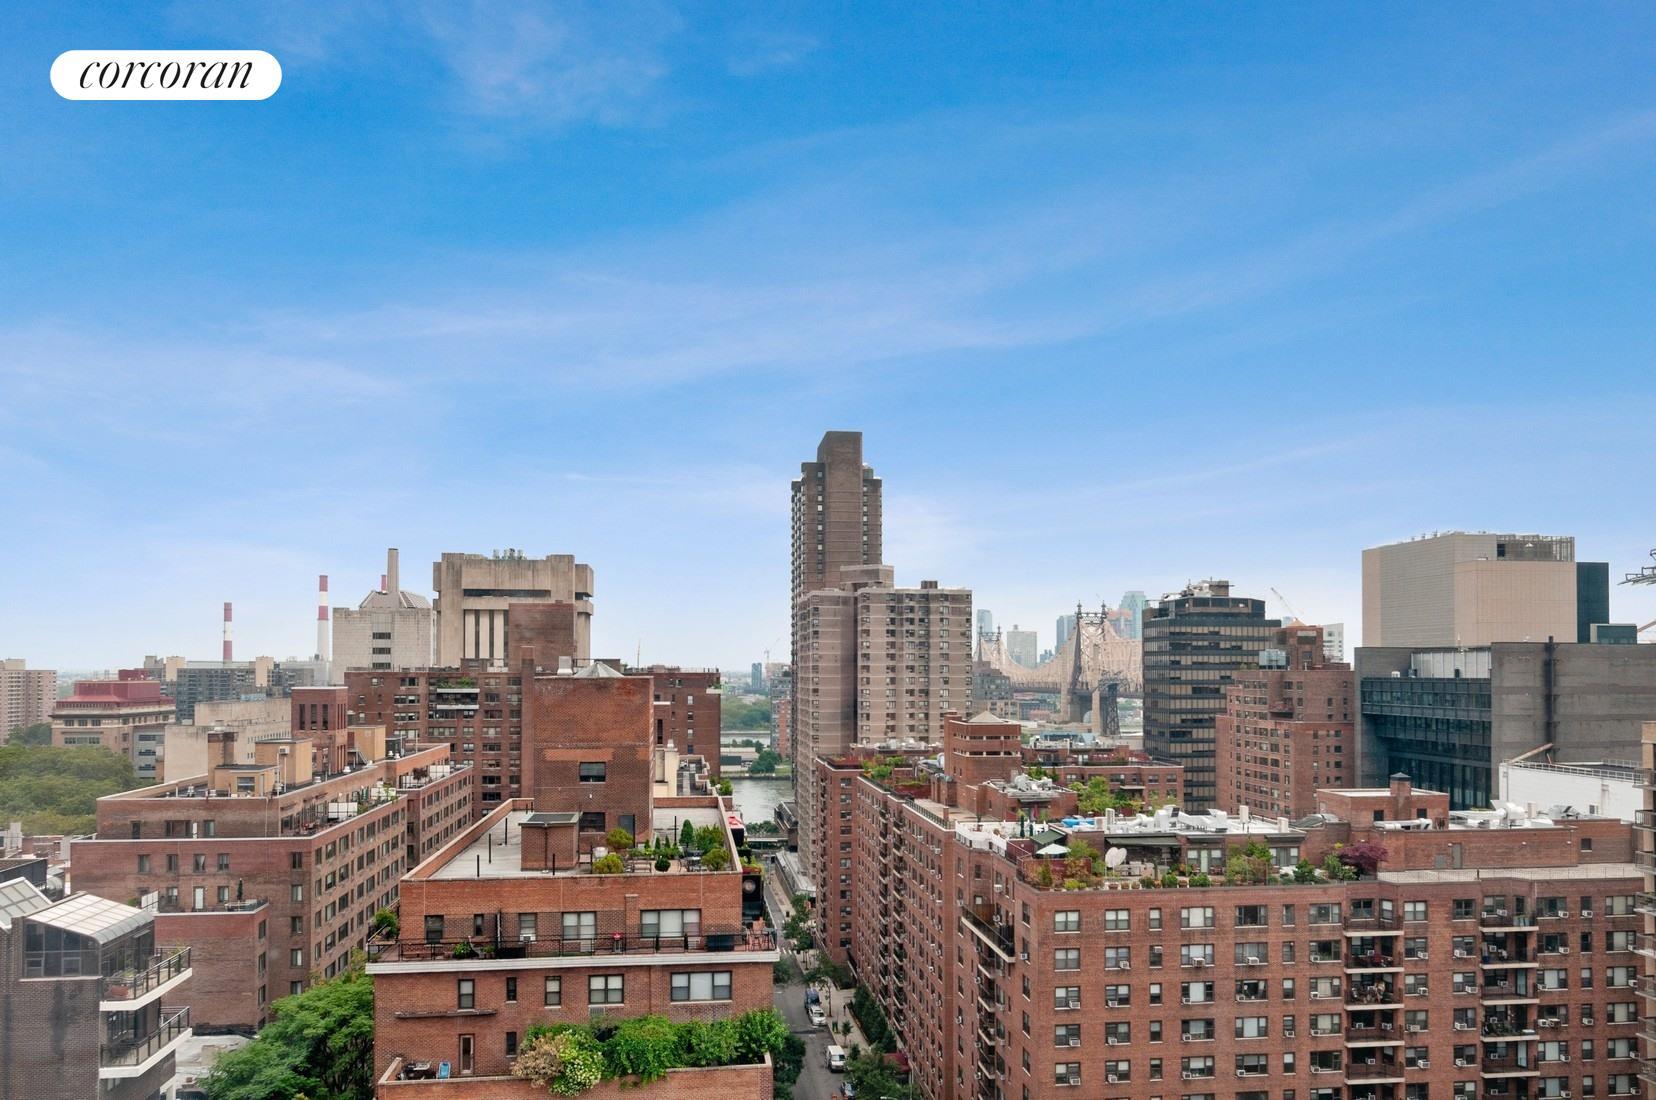 340 East 64th Street, Apt 18L, Manhattan, New York 10065